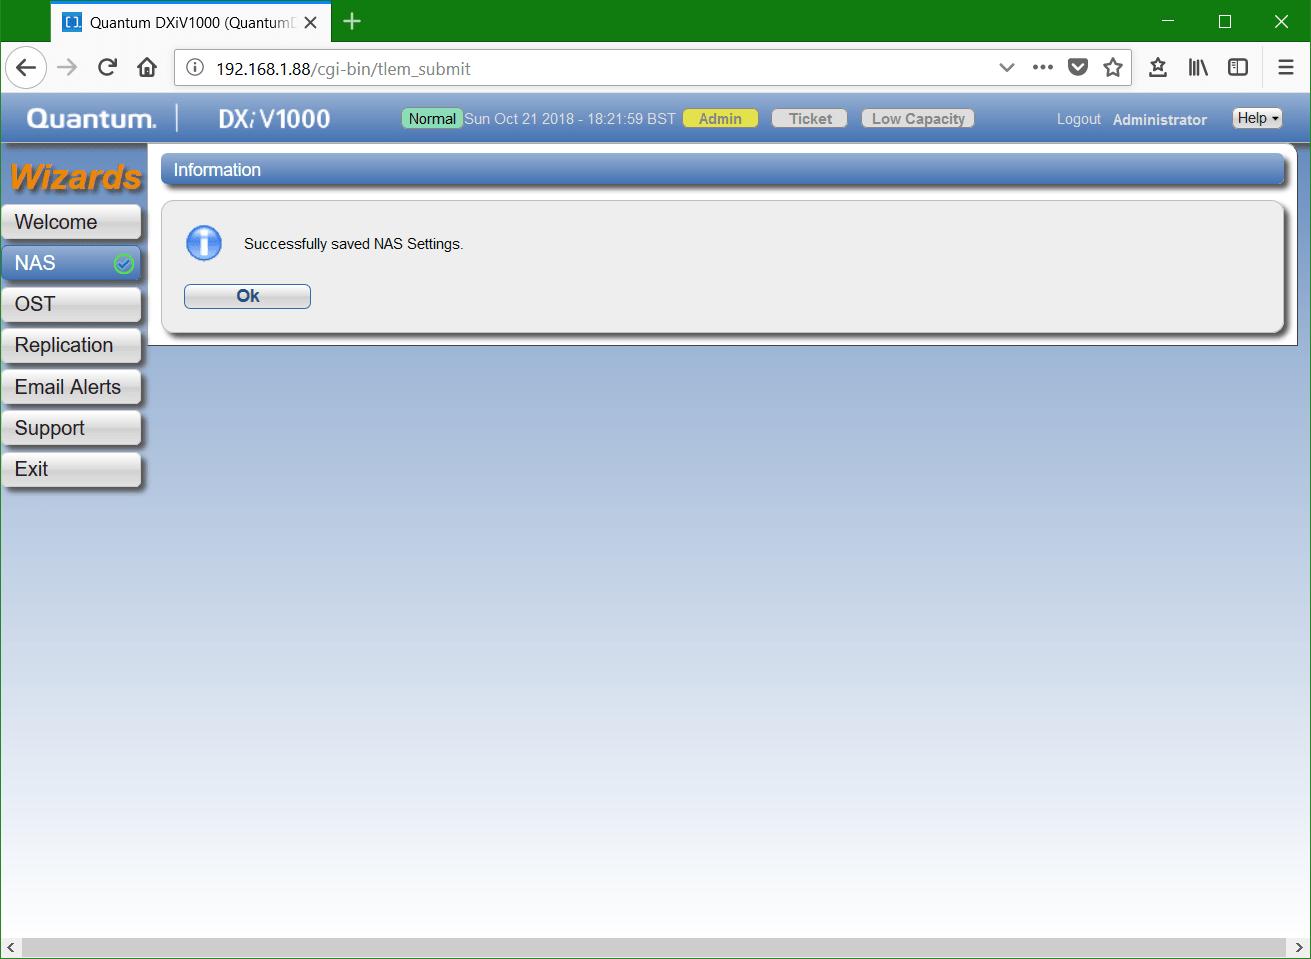 domalab.com Quantum DXi NFS wizard complete